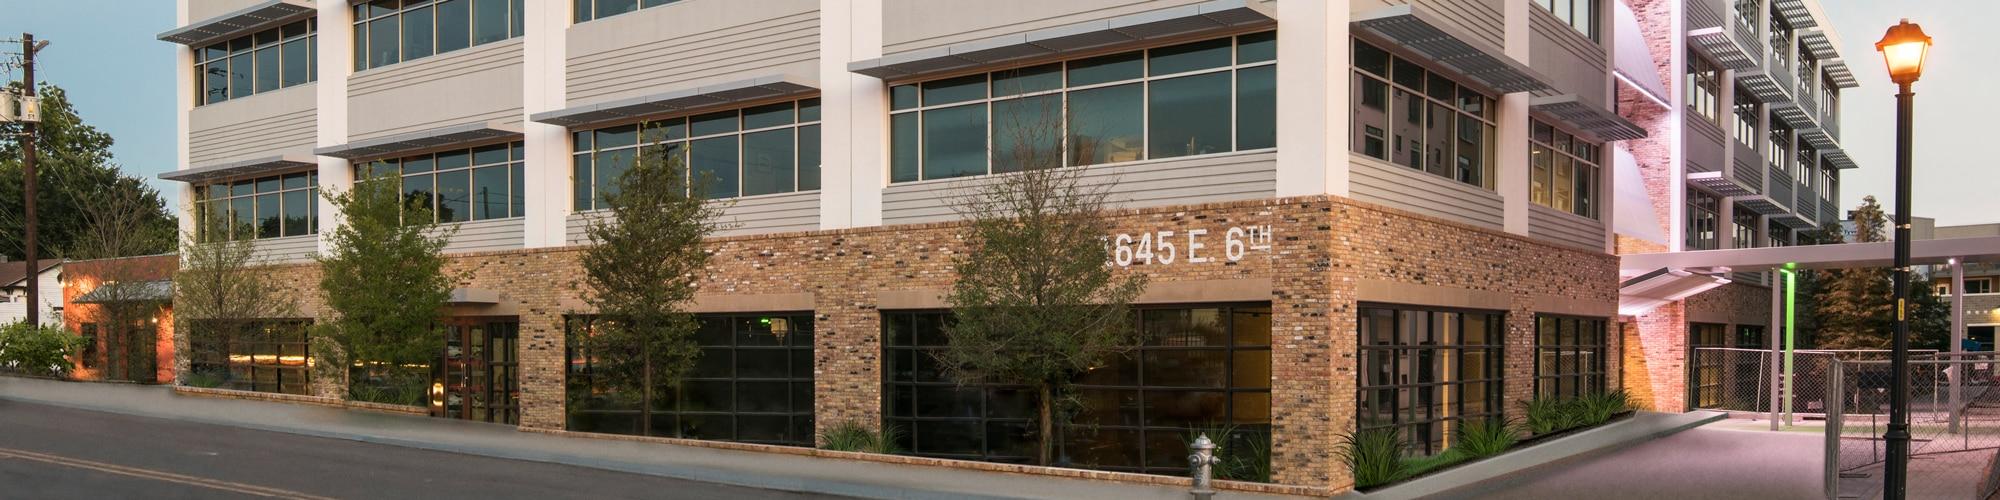 Eastside Village Office Development Austin, Texas | C3 Presents